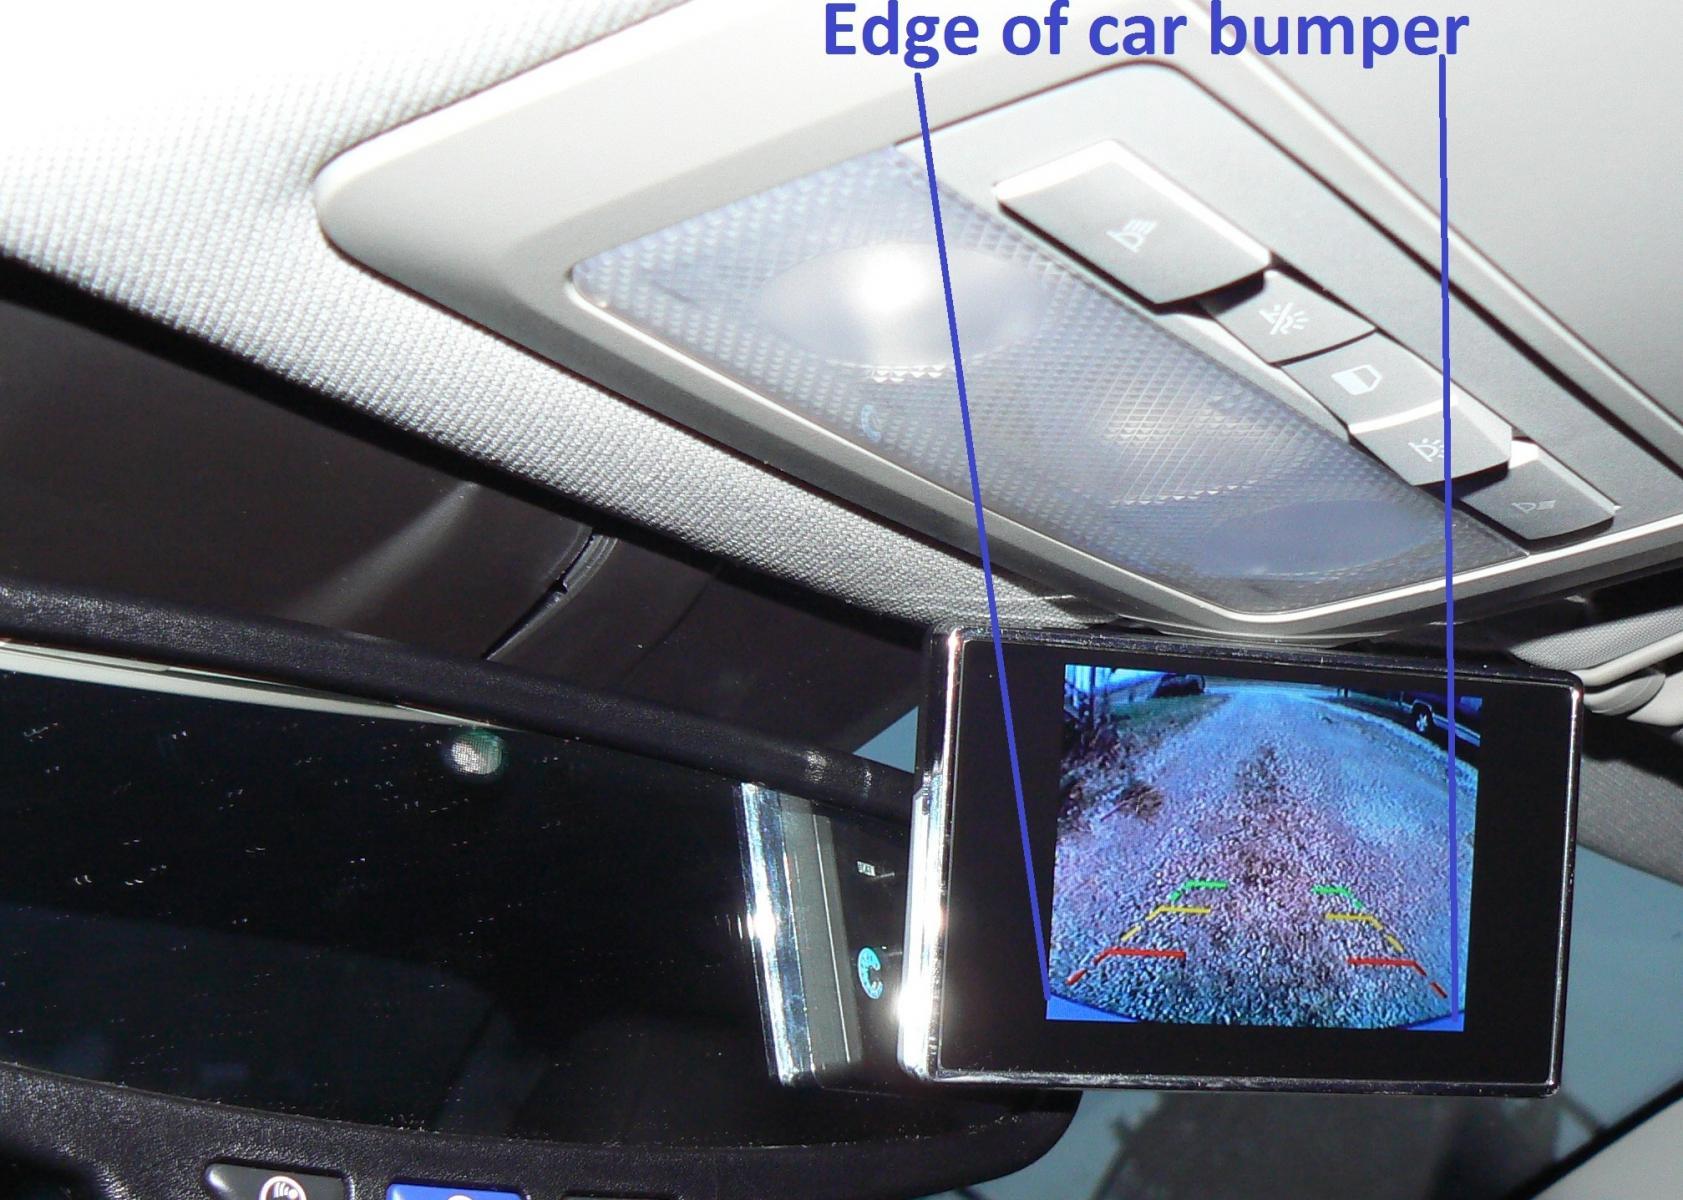 how to install a back up camera cheaply rh cruzetalk com Boyo Backup Camera Installation Guide Backup Camera Wiring Diagram for VW